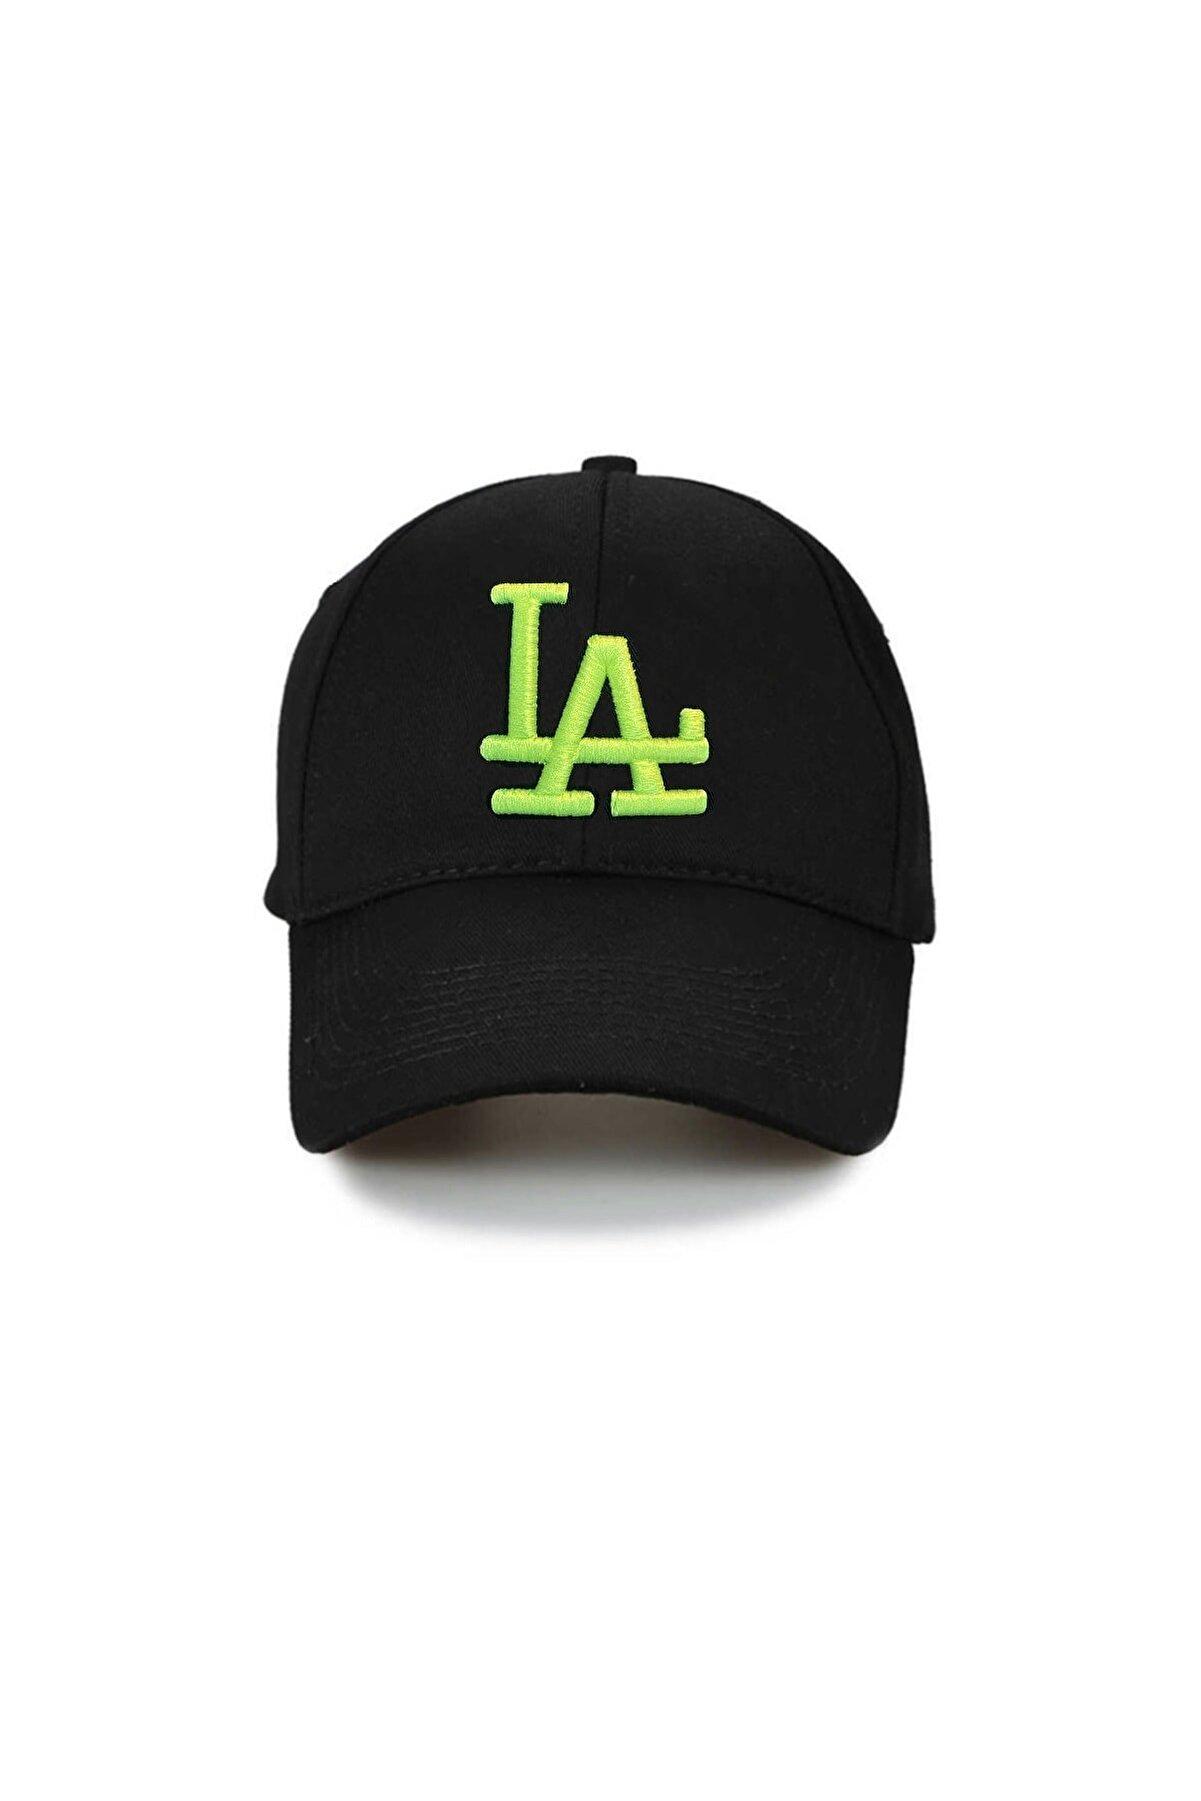 NuxFah La Los Angeles Unisex Siyah Şapka Özel Forforlu Yeşil Nakış